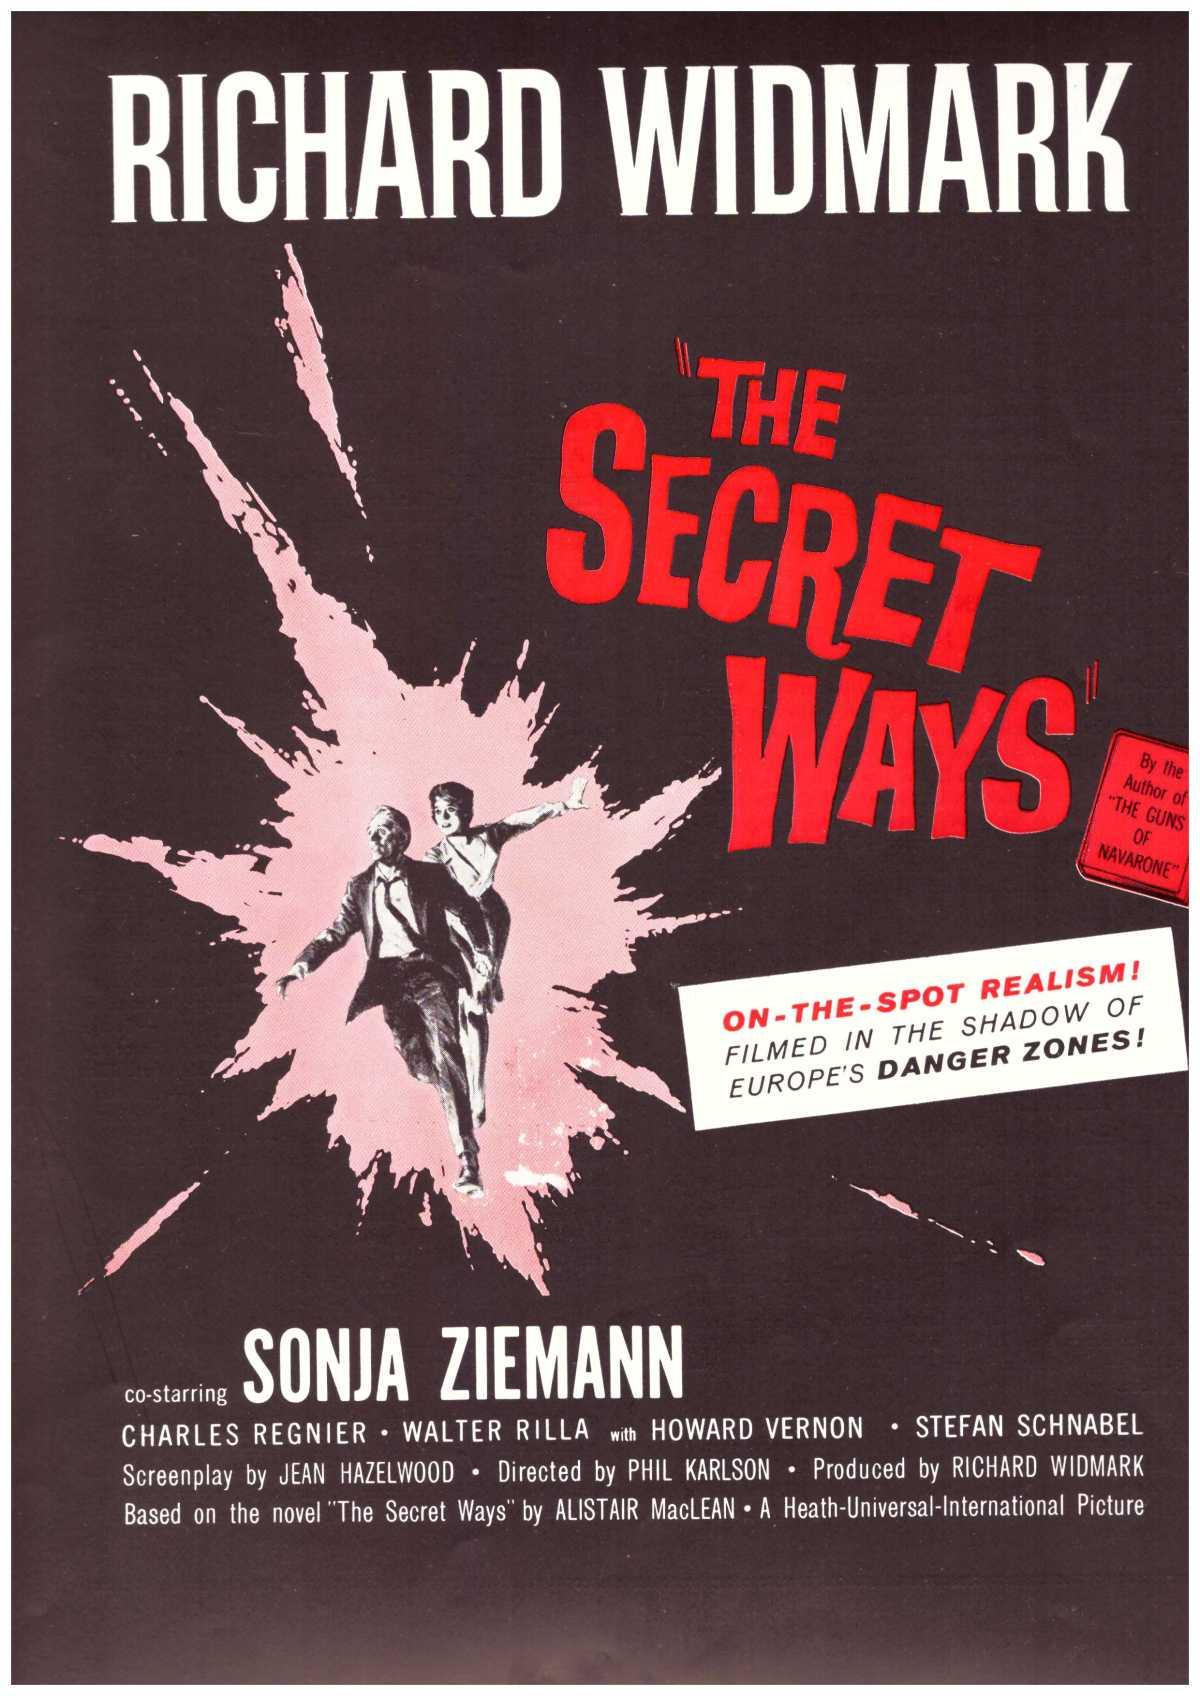 The Secret Ways (1961)***